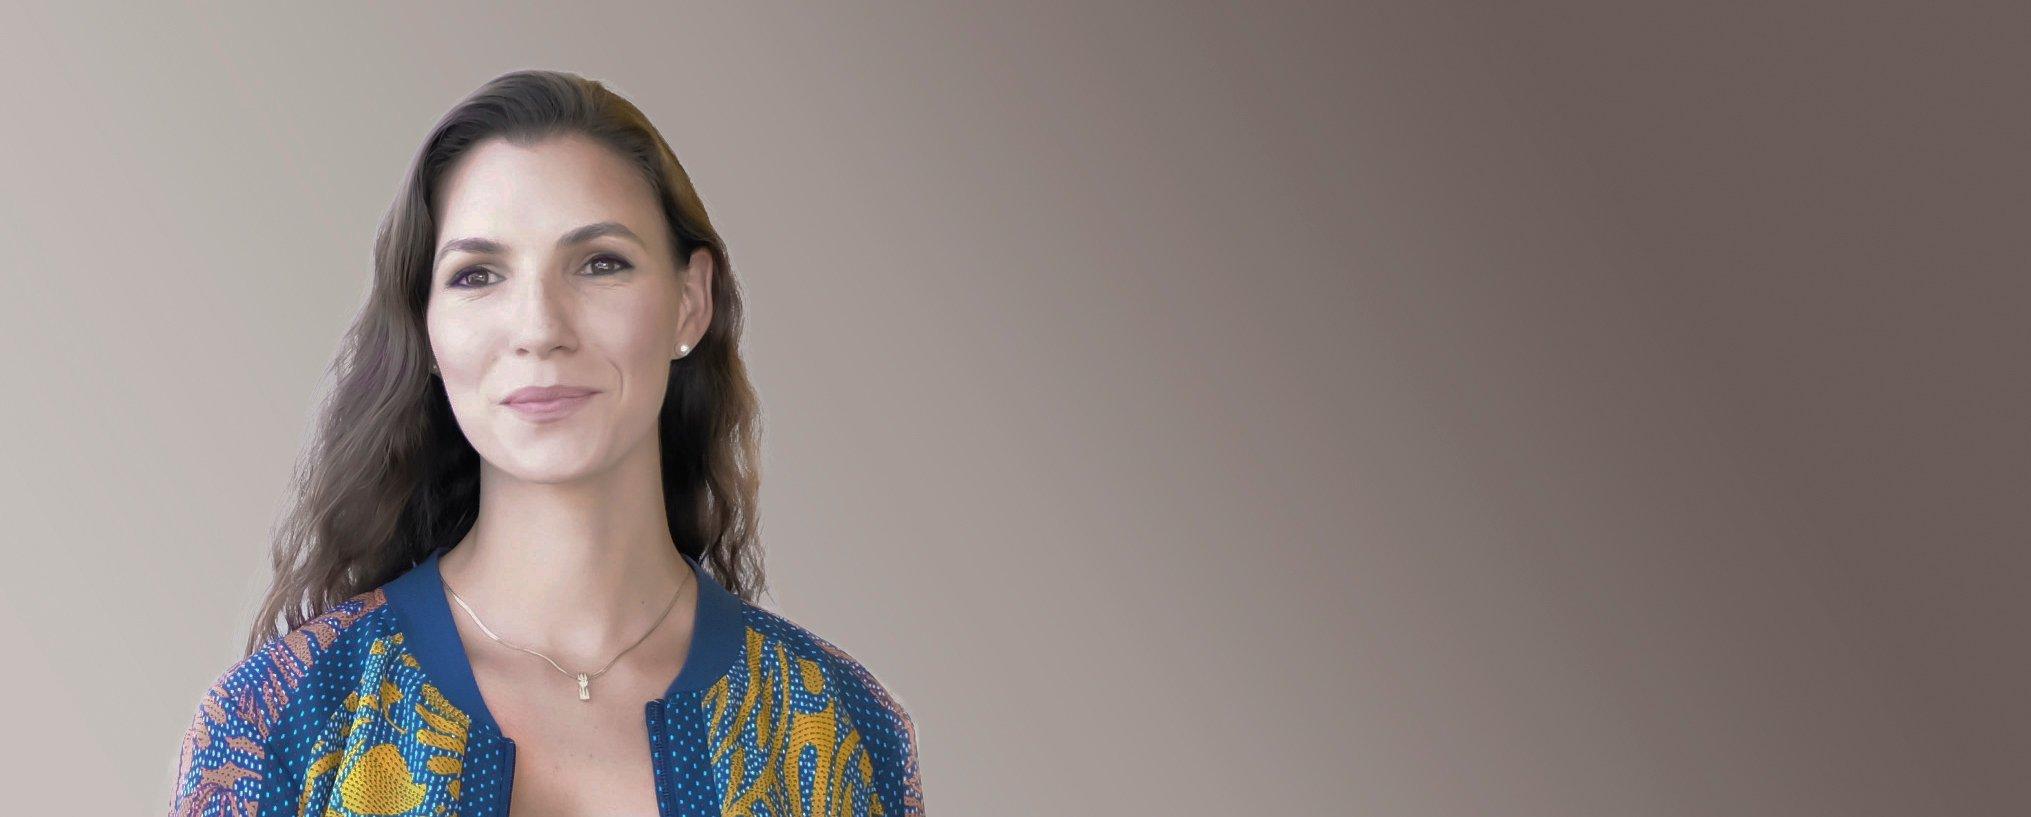 Valeria Gidaszewski-Lassalle has been promoted to an associate at HBA Los Angeles.